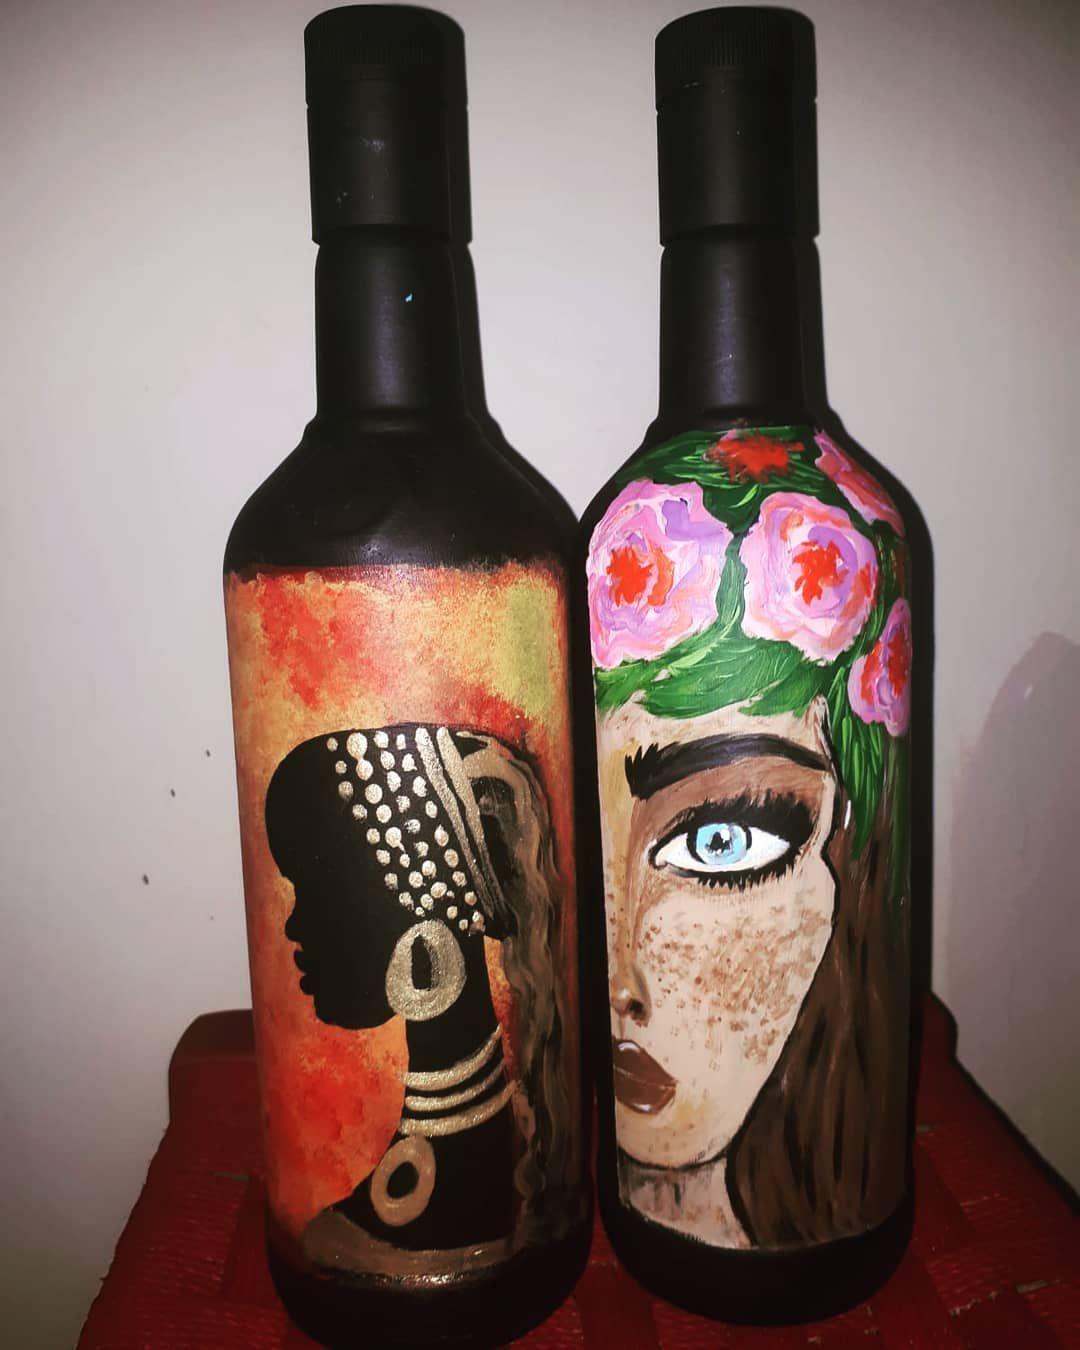 🍾🙋🏿♀️🙆🏿♀️• • • • #aşk#happy#fridakahlo#strong#diago #women#men#art #illustration #drawing #draw #picture #artist #sketch#sketchbook #paper#beautiful #love#amore#paint#nature#alone#art#flower#creativedesign#desing#new#black#colour